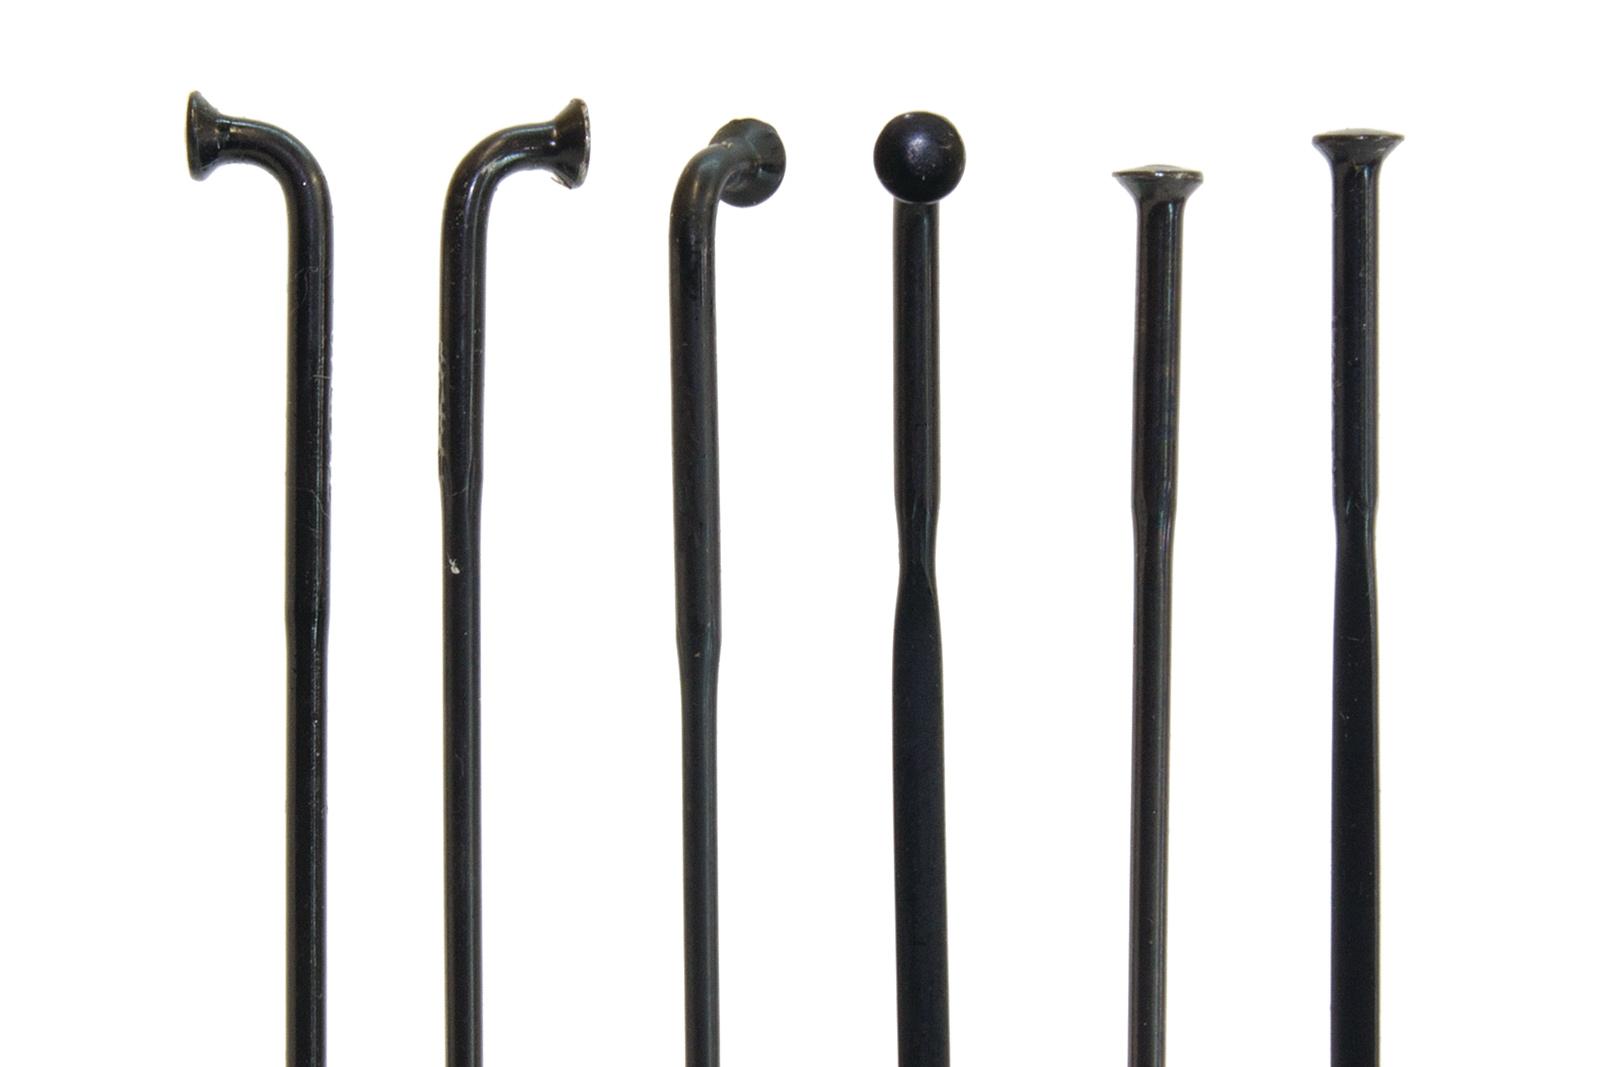 1.8mm 1.6mm black lot of 4 spokes new DT Swiss J Bend Competition Spoke 286mm